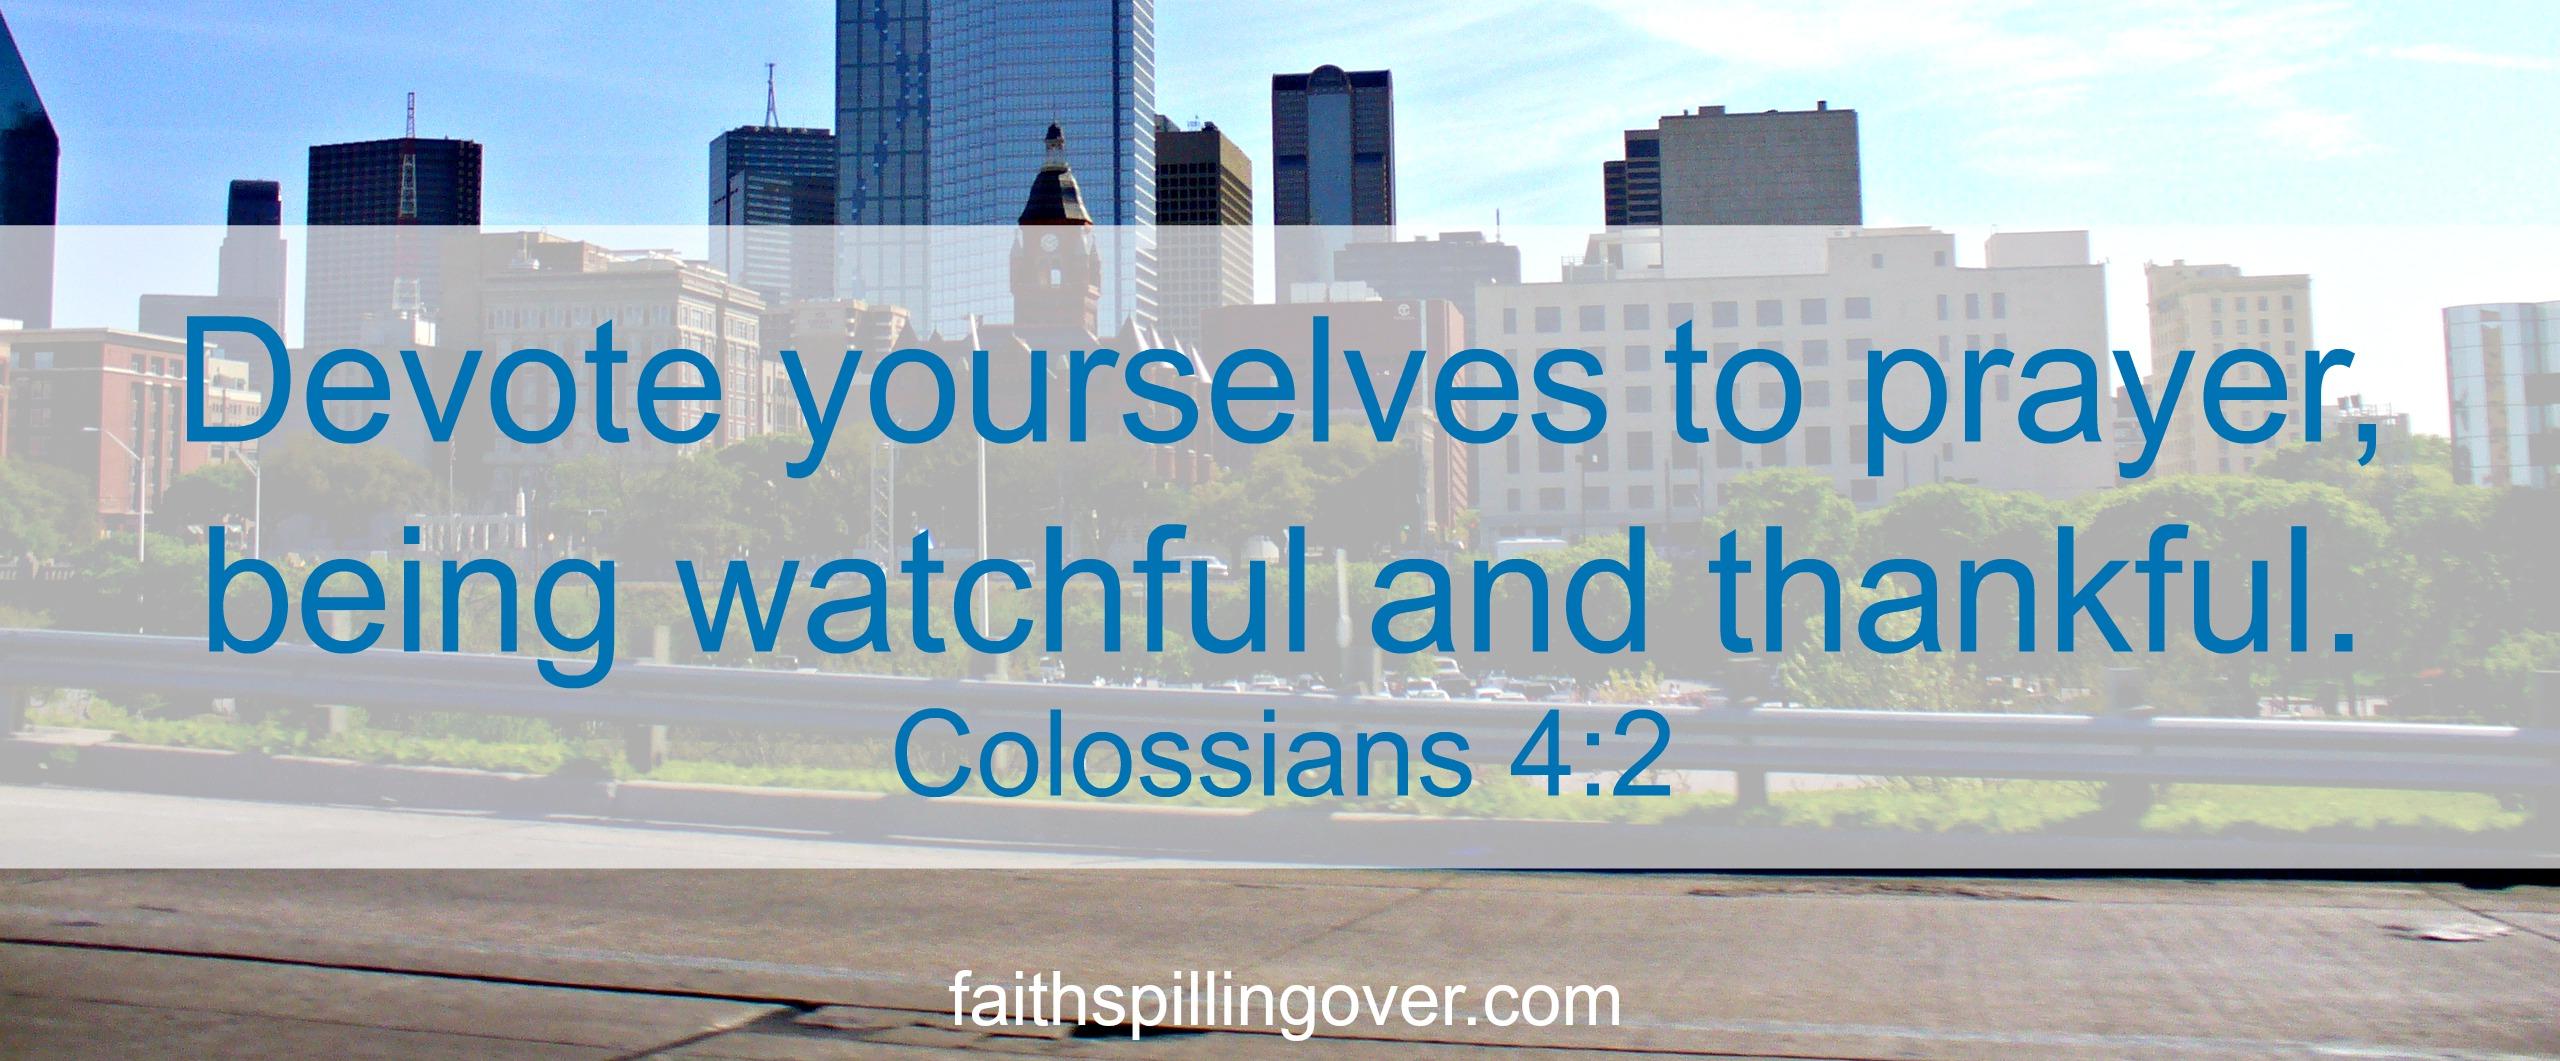 Devote Yourselves to Prayer Scripture